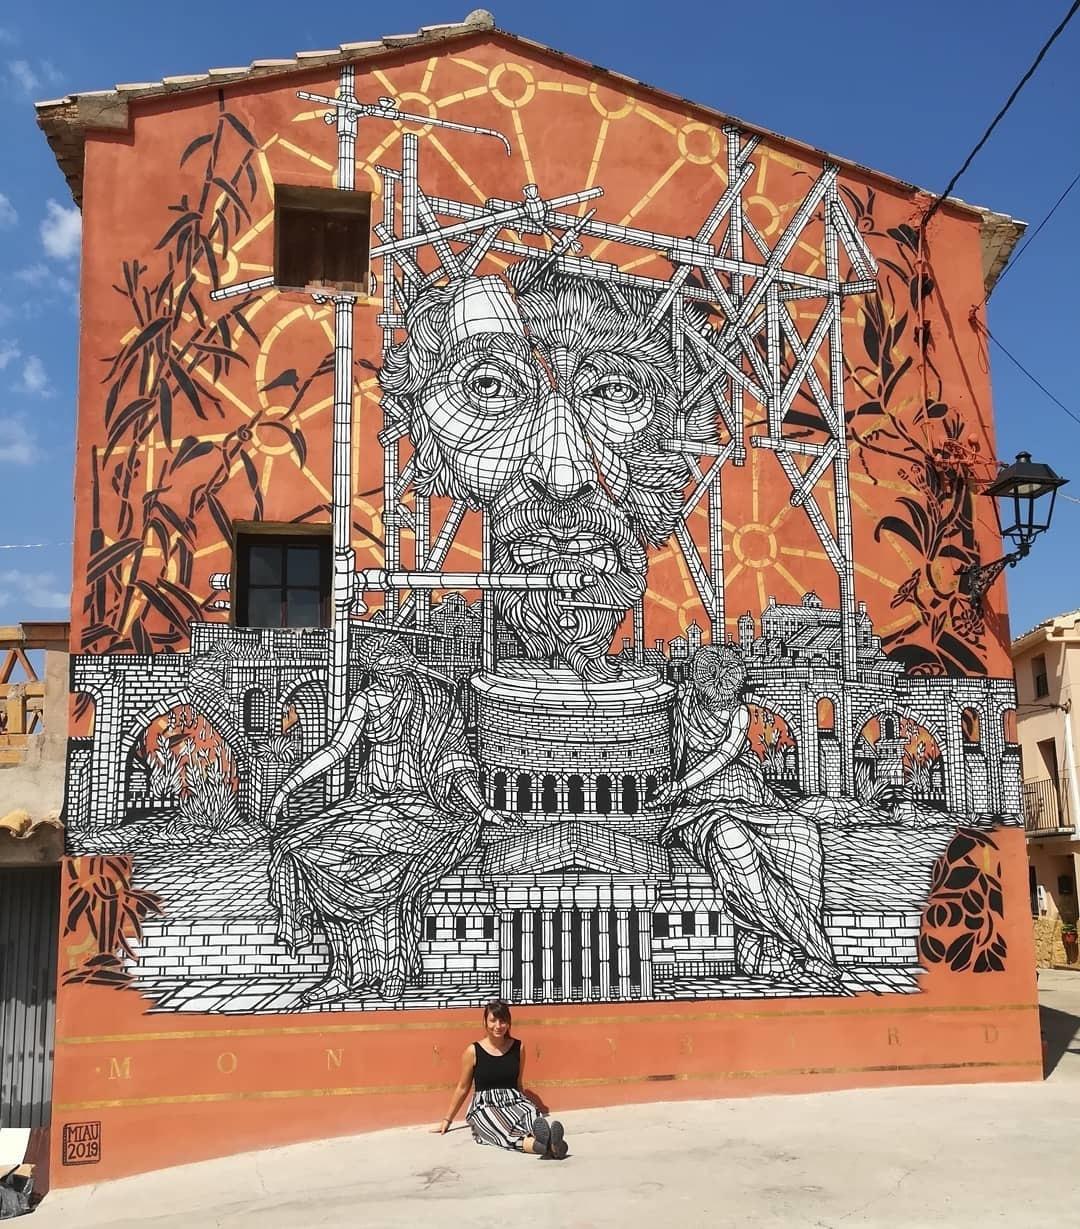 MonkeyBird @ Fanzara, Spain